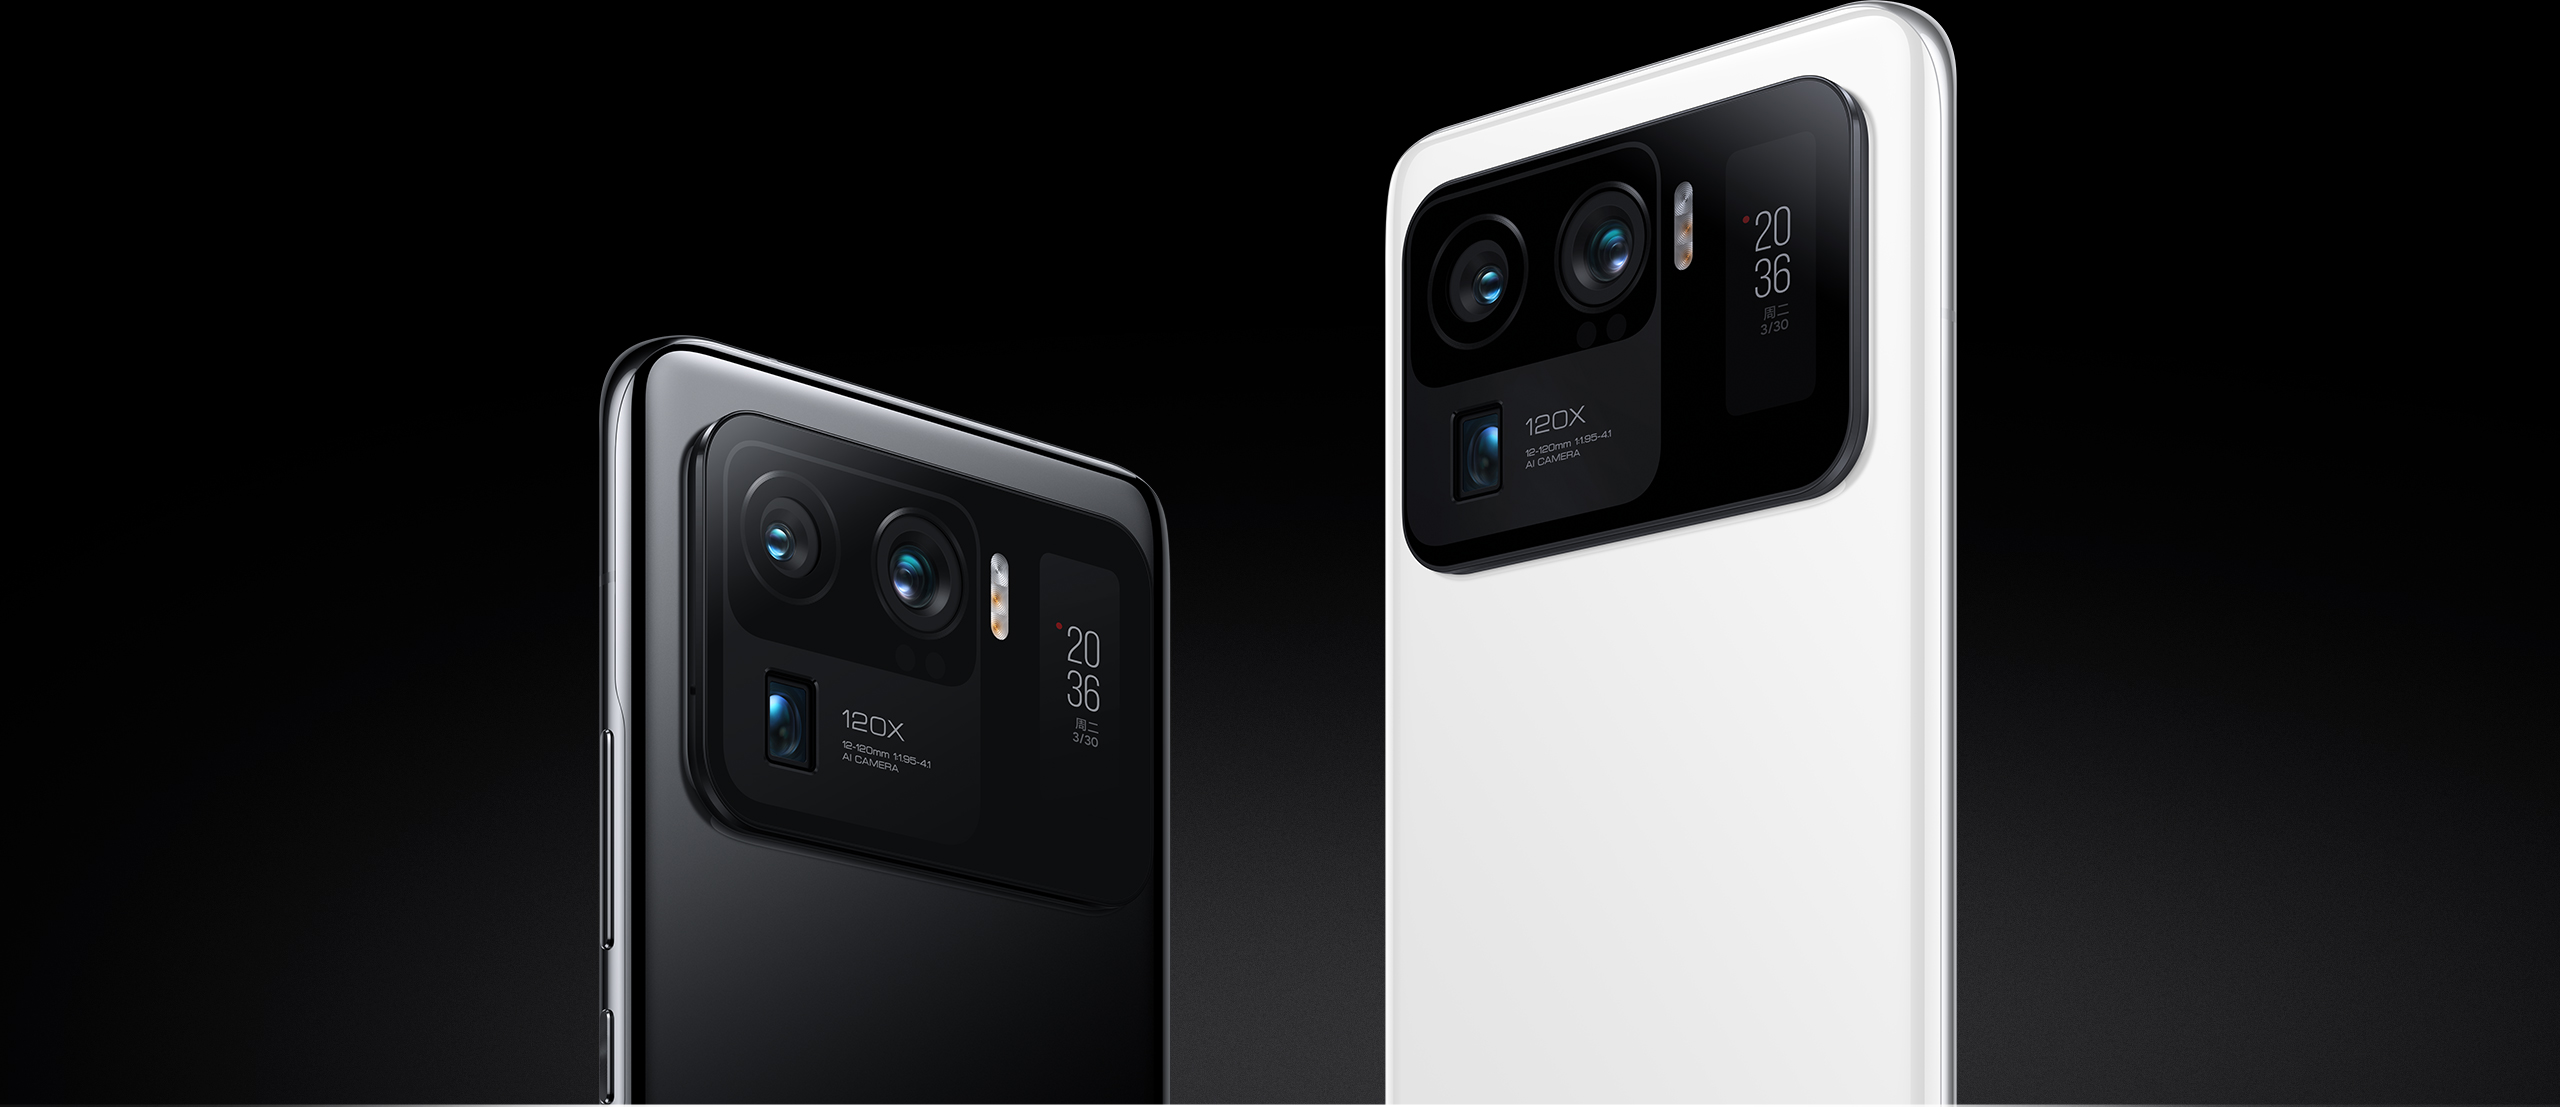 Kamera belakang Mi 11 Ultra.